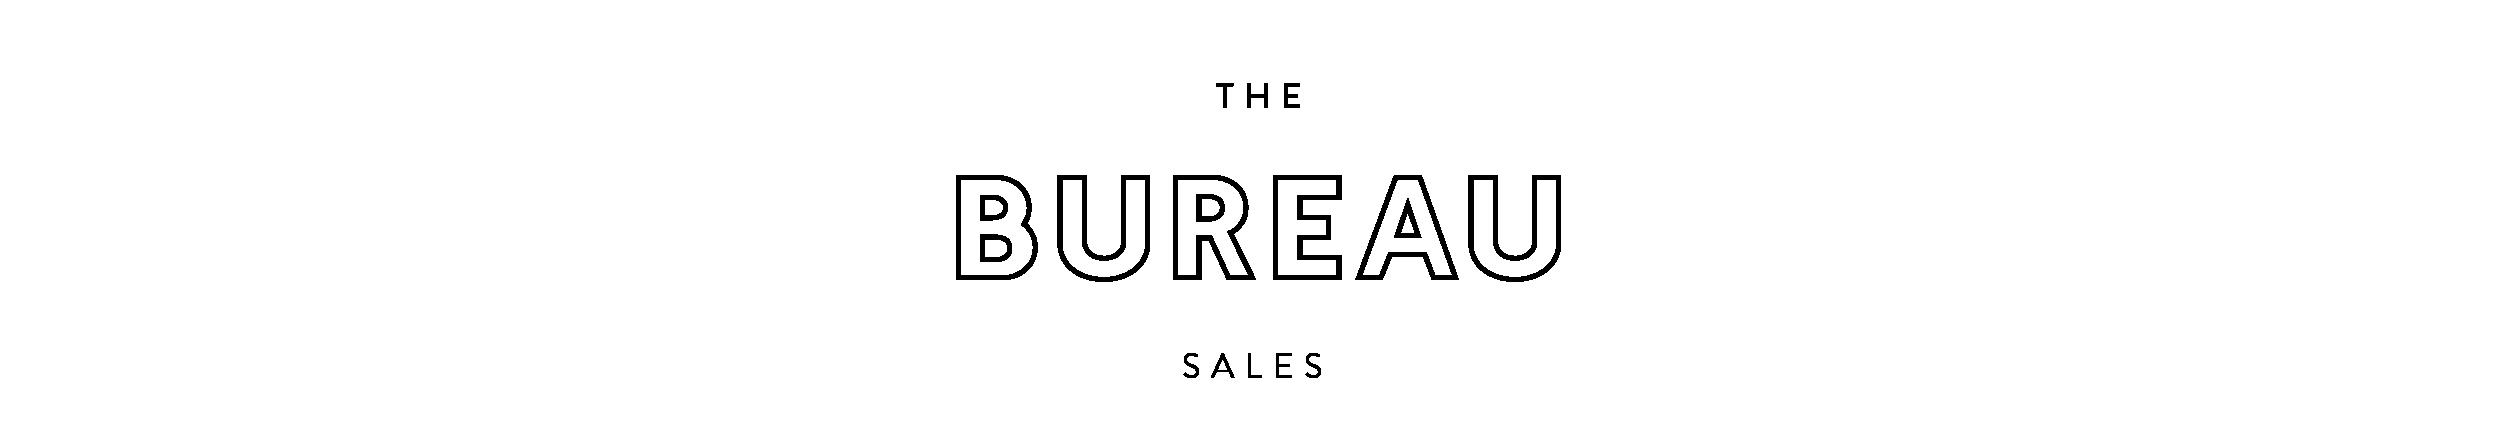 2004efac-b05d-49eb-aec1-20b241ffe262.png